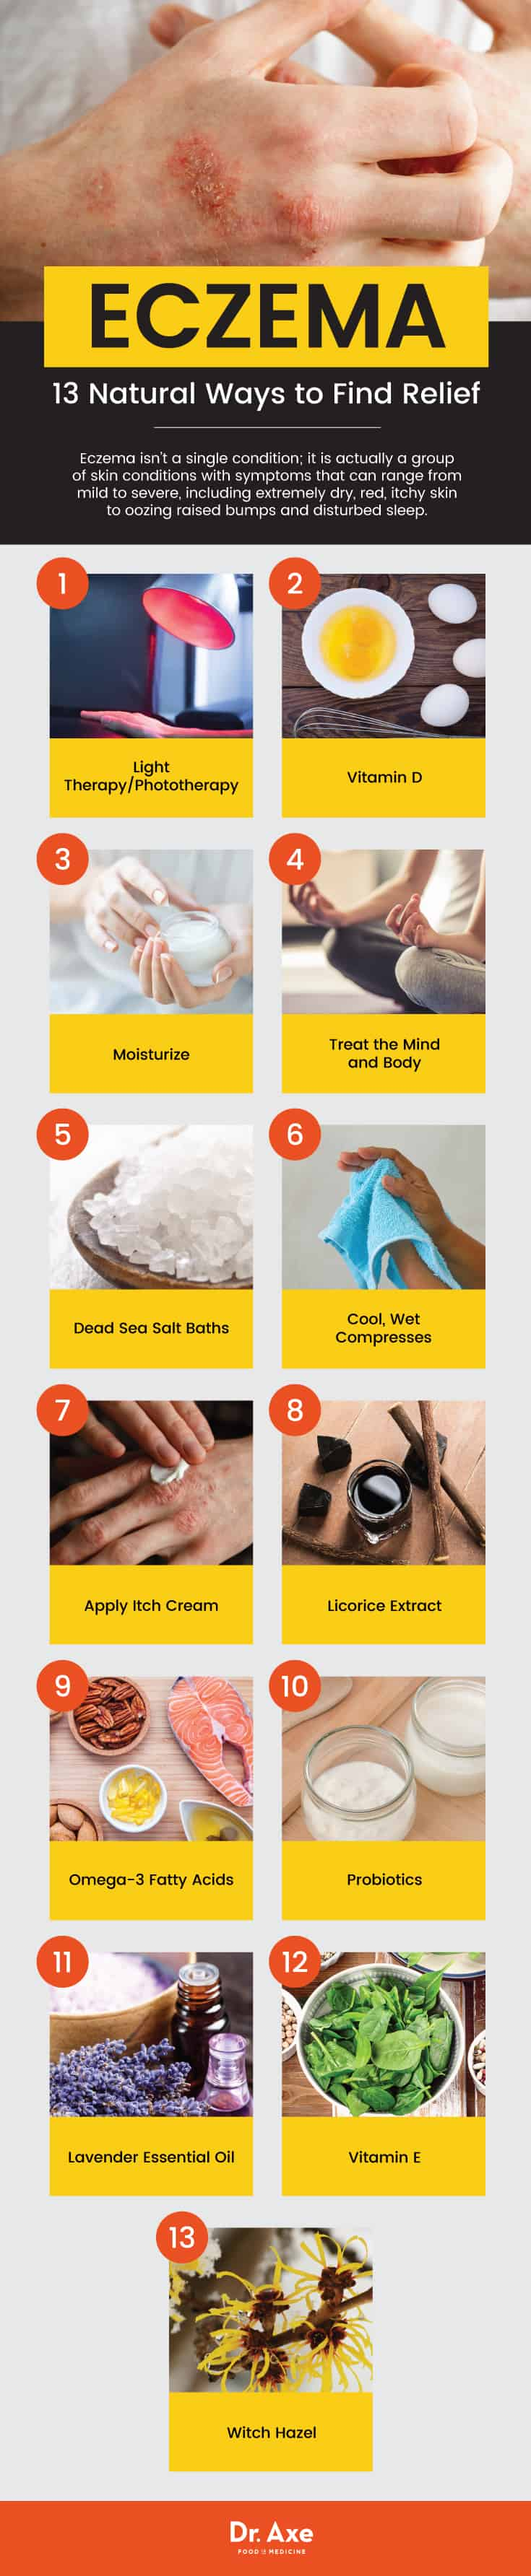 Eczema treatment: 13 natural ways - Dr. Axe